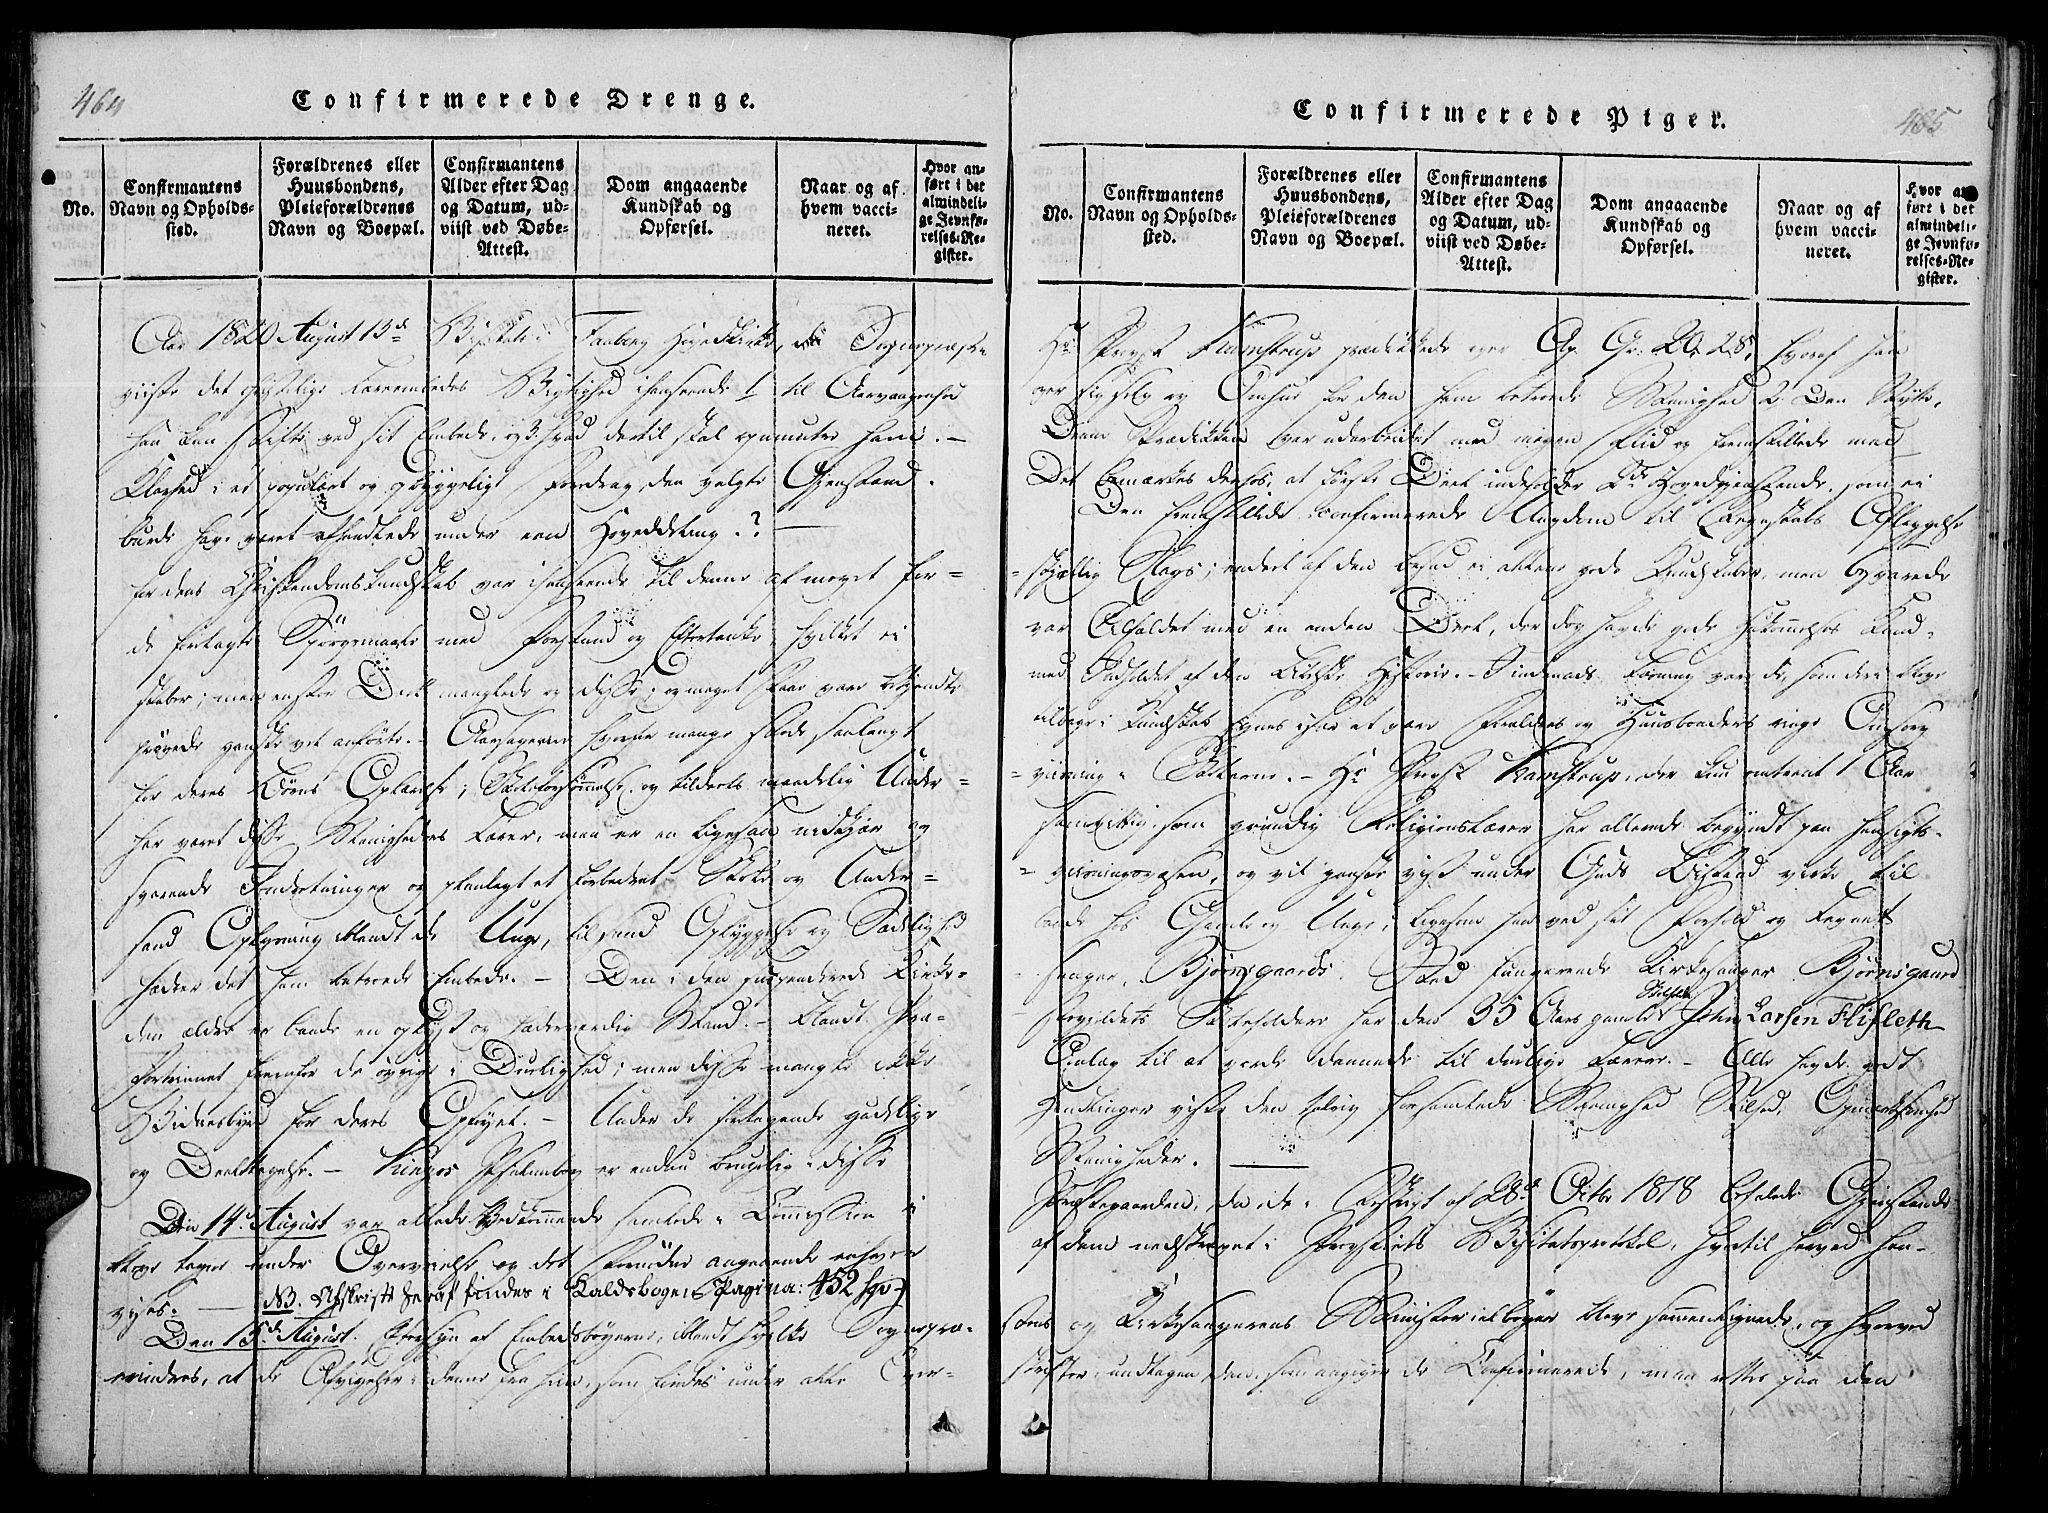 SAH, Fåberg prestekontor, Ministerialbok nr. 3, 1818-1833, s. 464-465